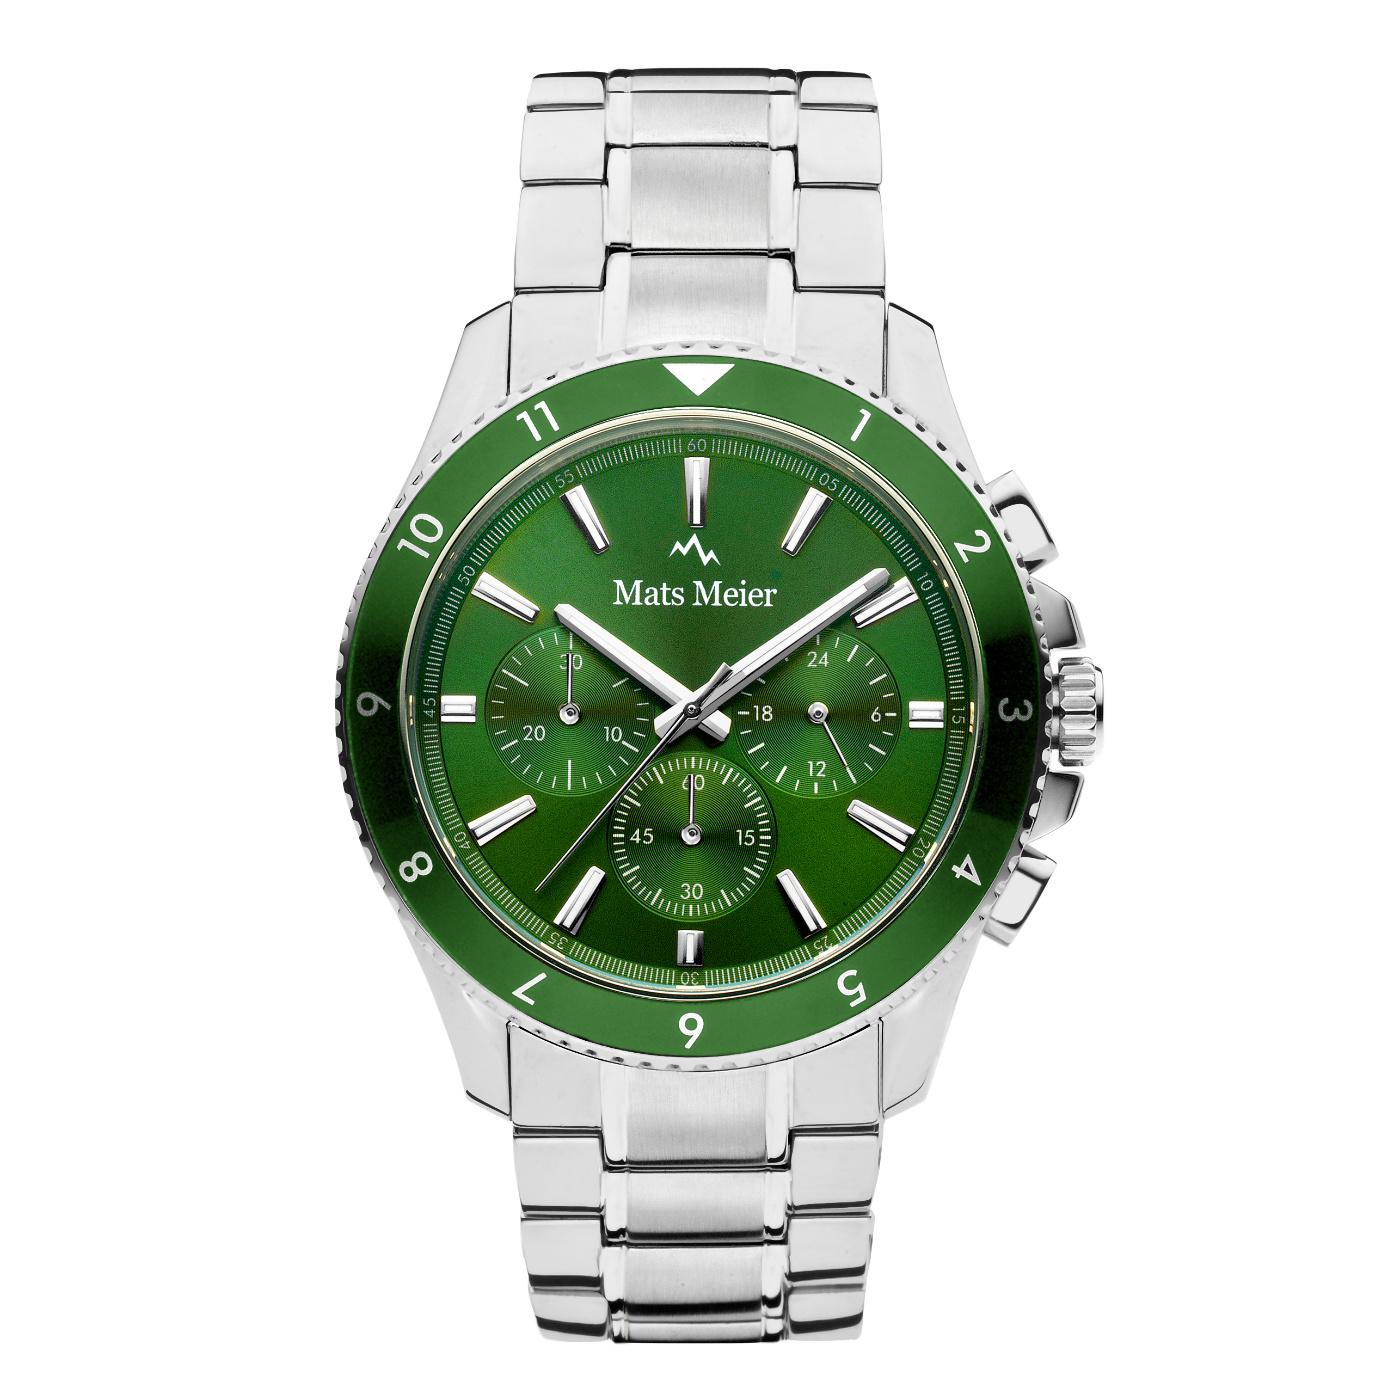 Mats Meier Ponte Dei Salti Mens Watch Silver / Green